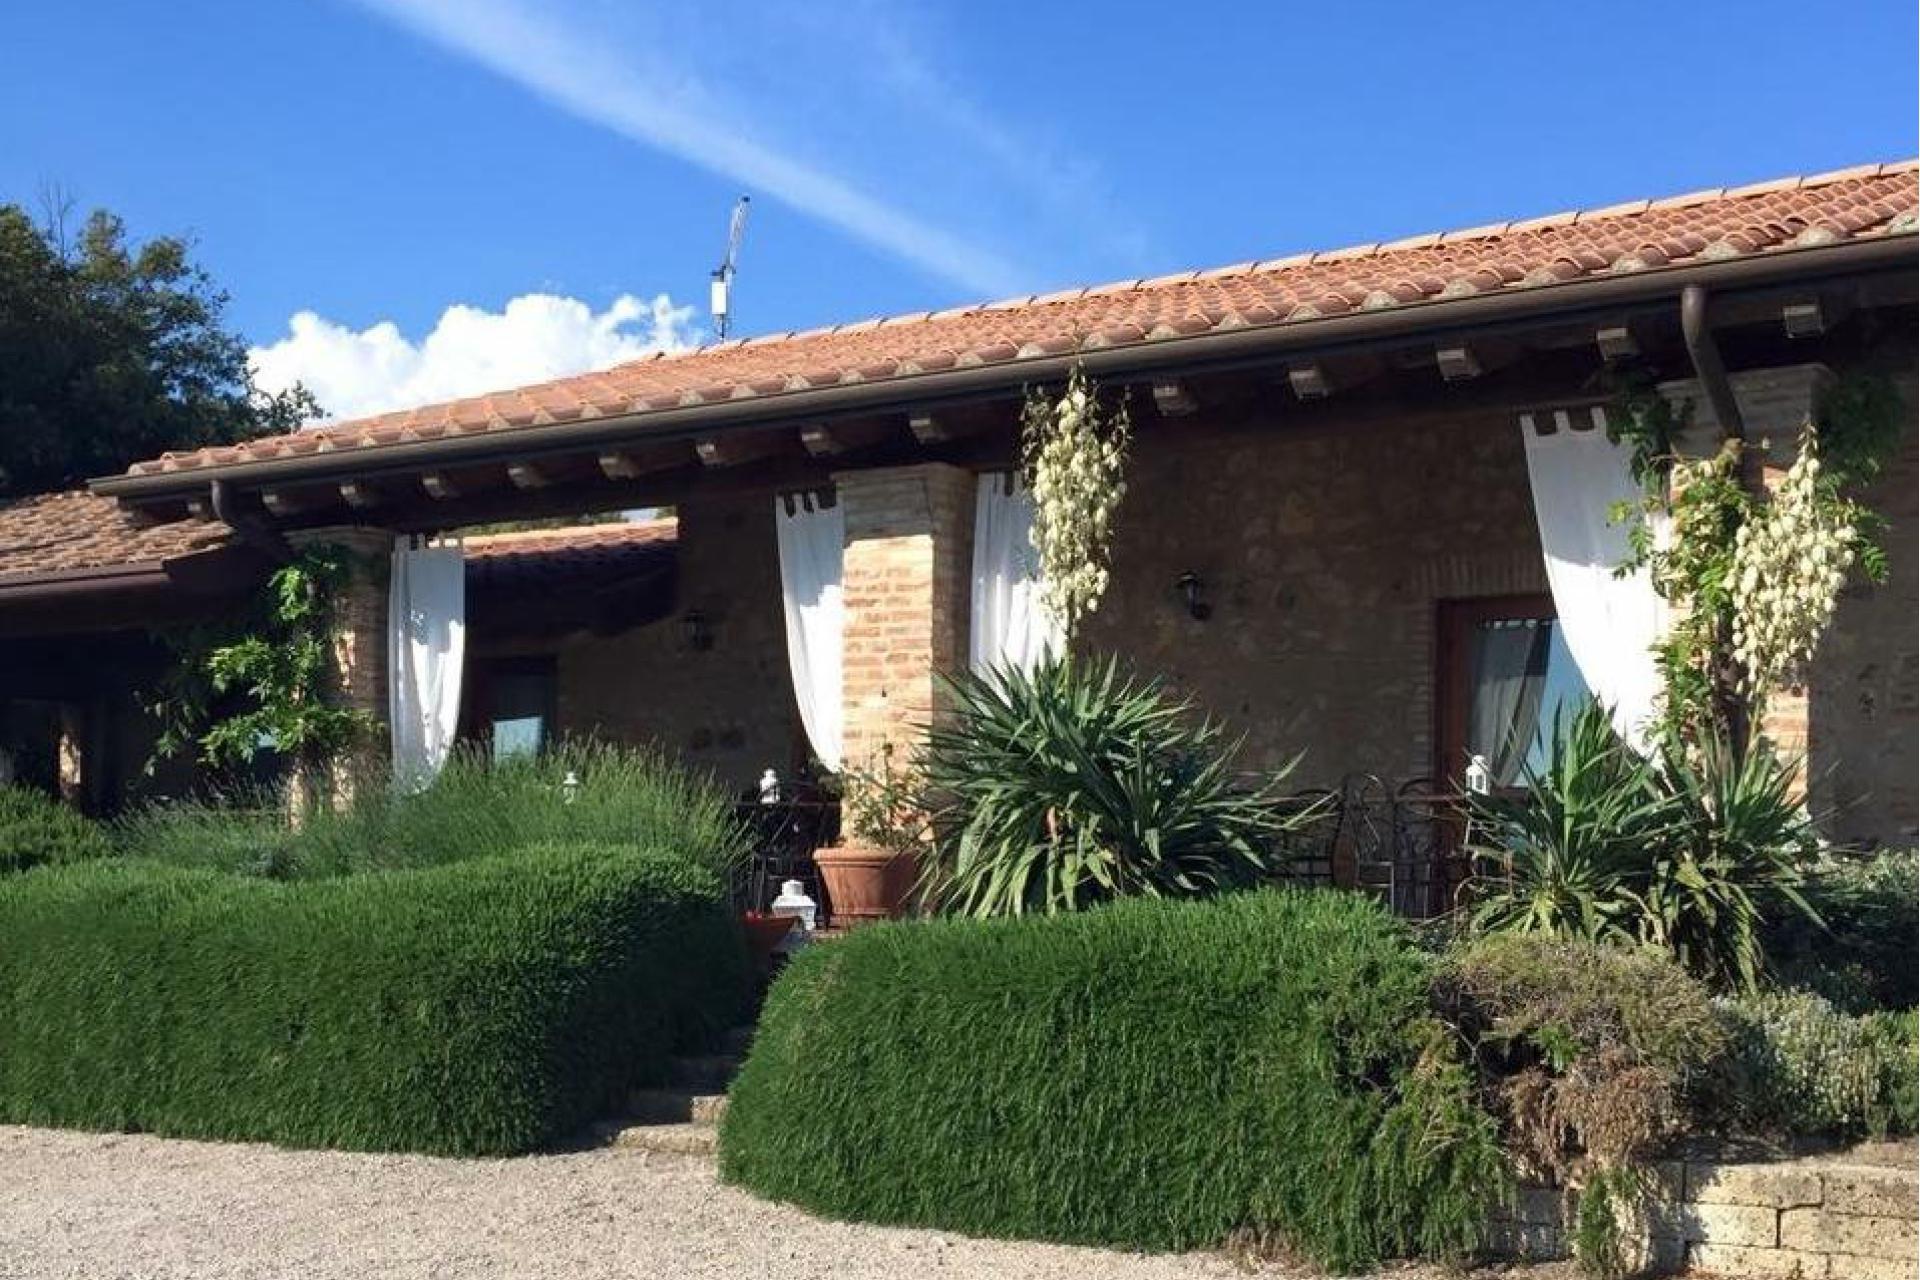 Agriturismo Toscana Piccola fattoria biologica nelle colline toscane